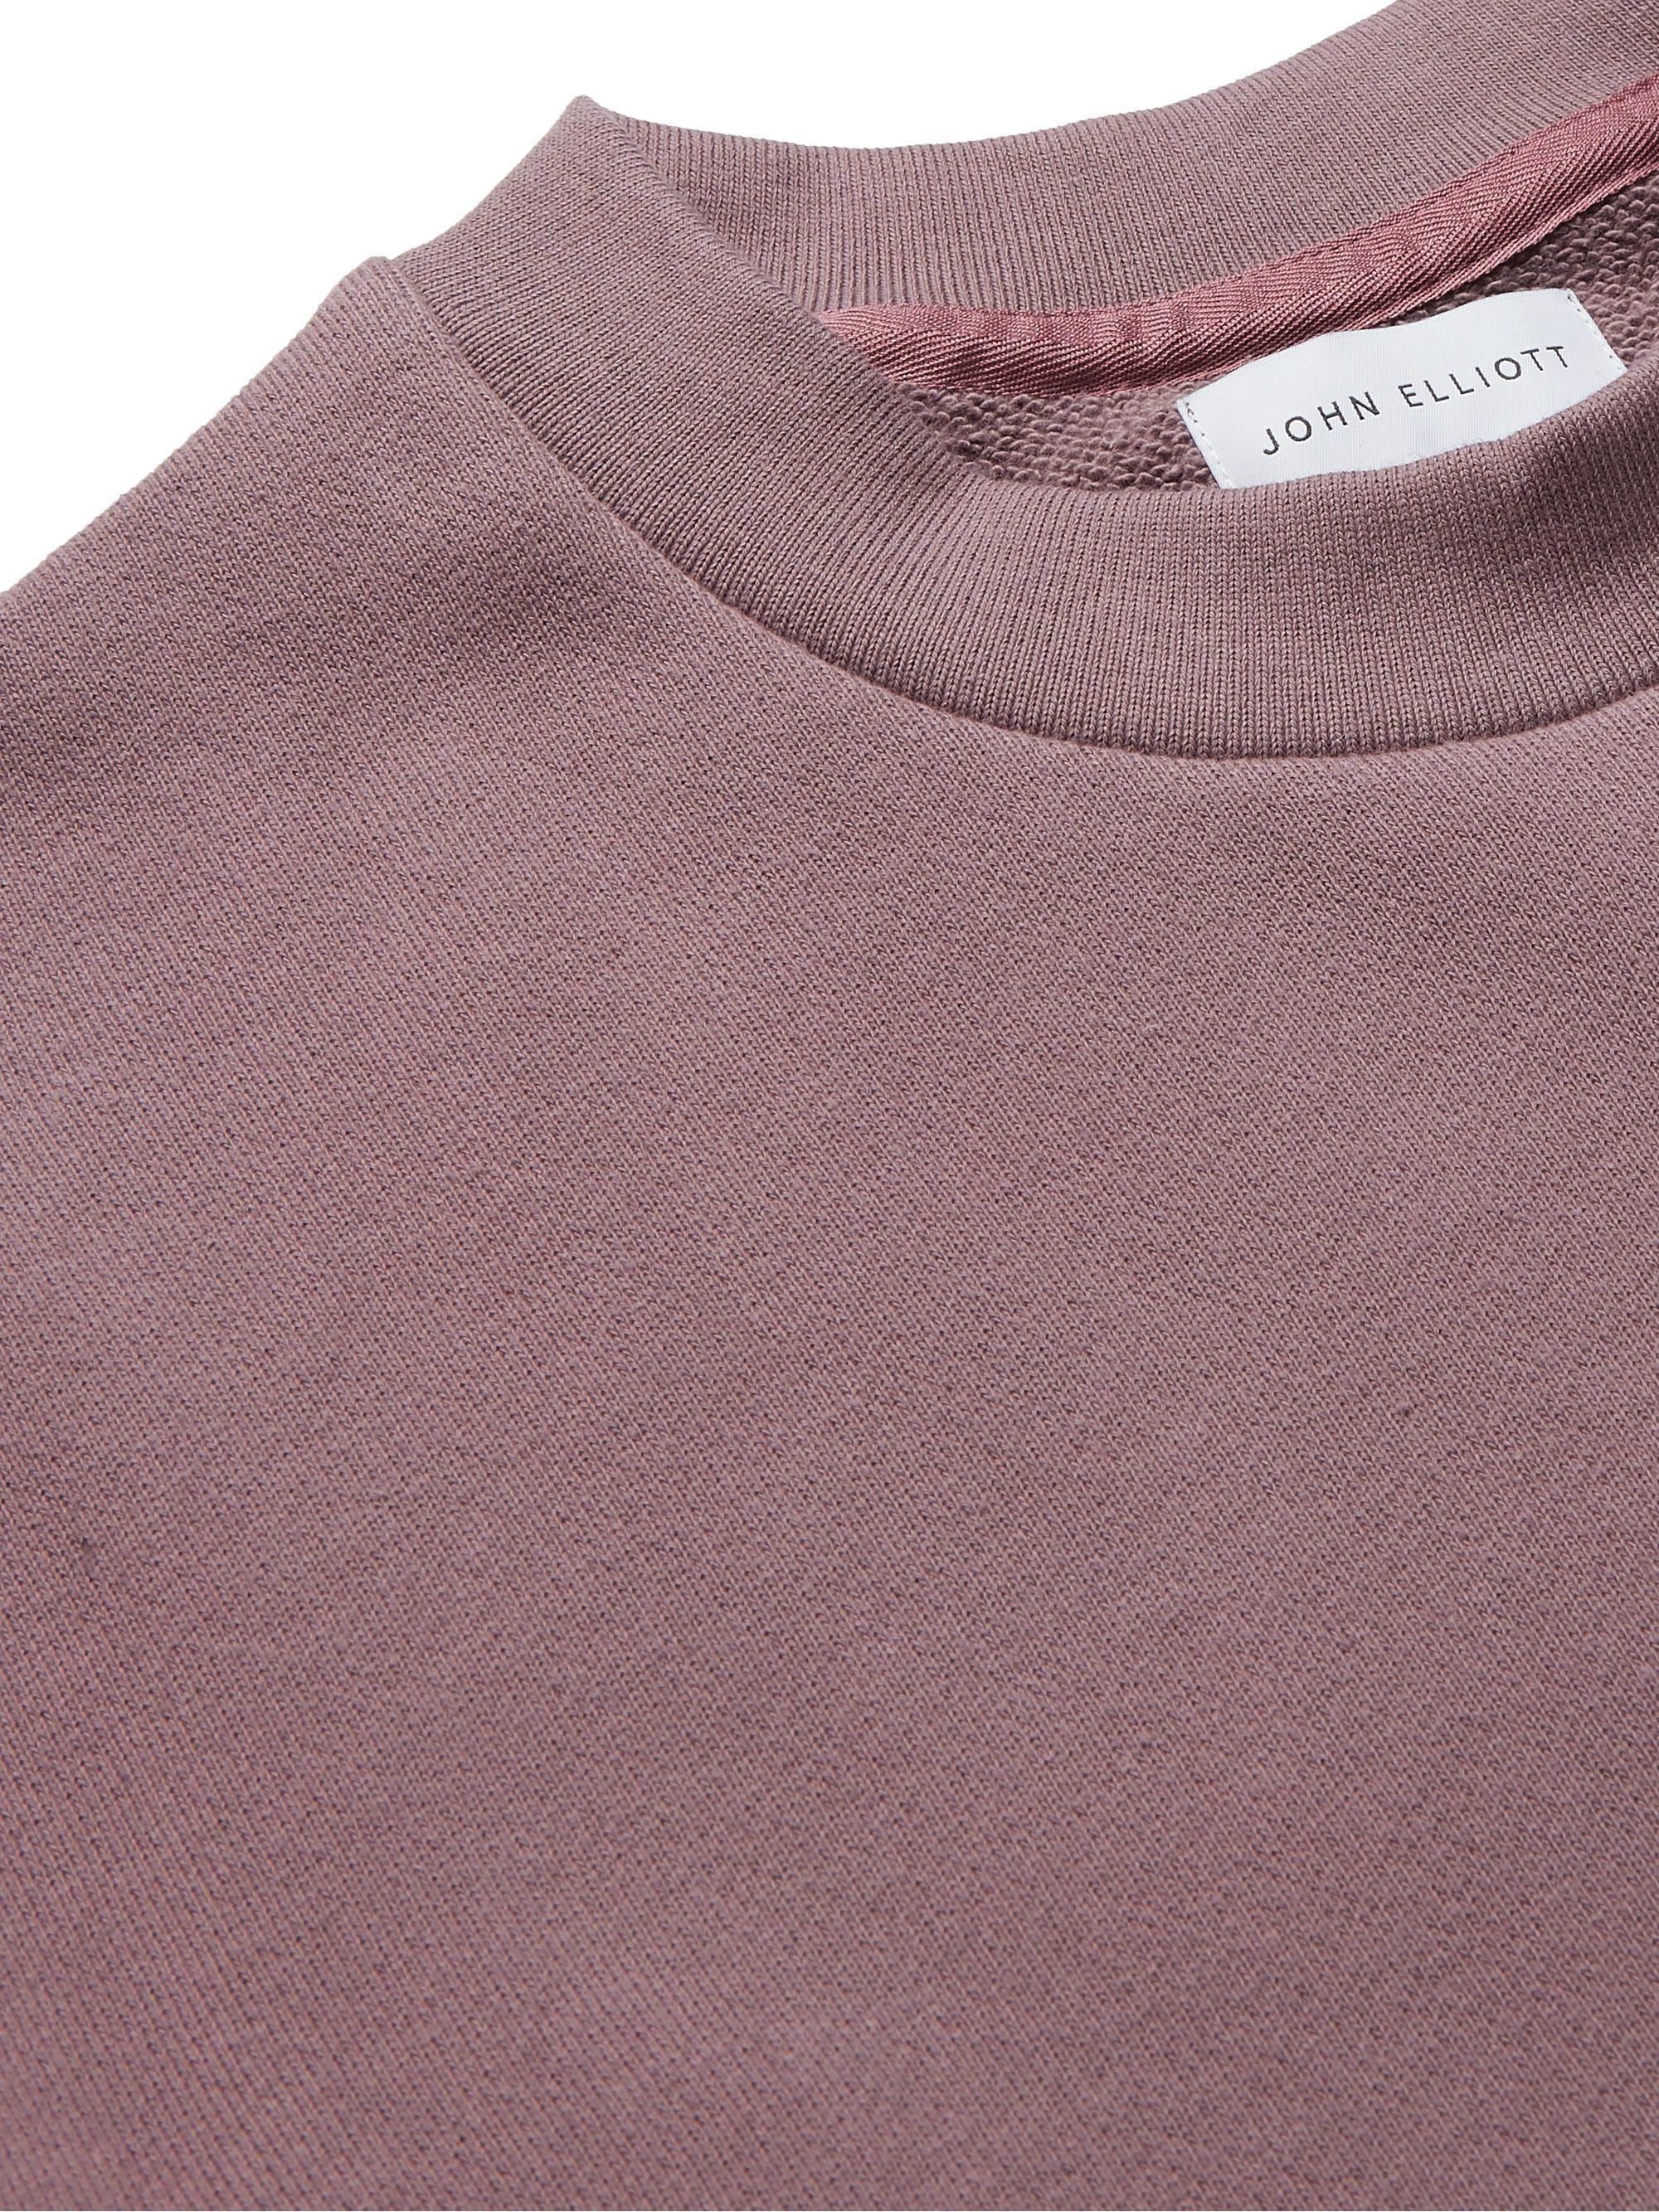 Purple Loopback Cotton-jersey Sweatshirt | John Elliott